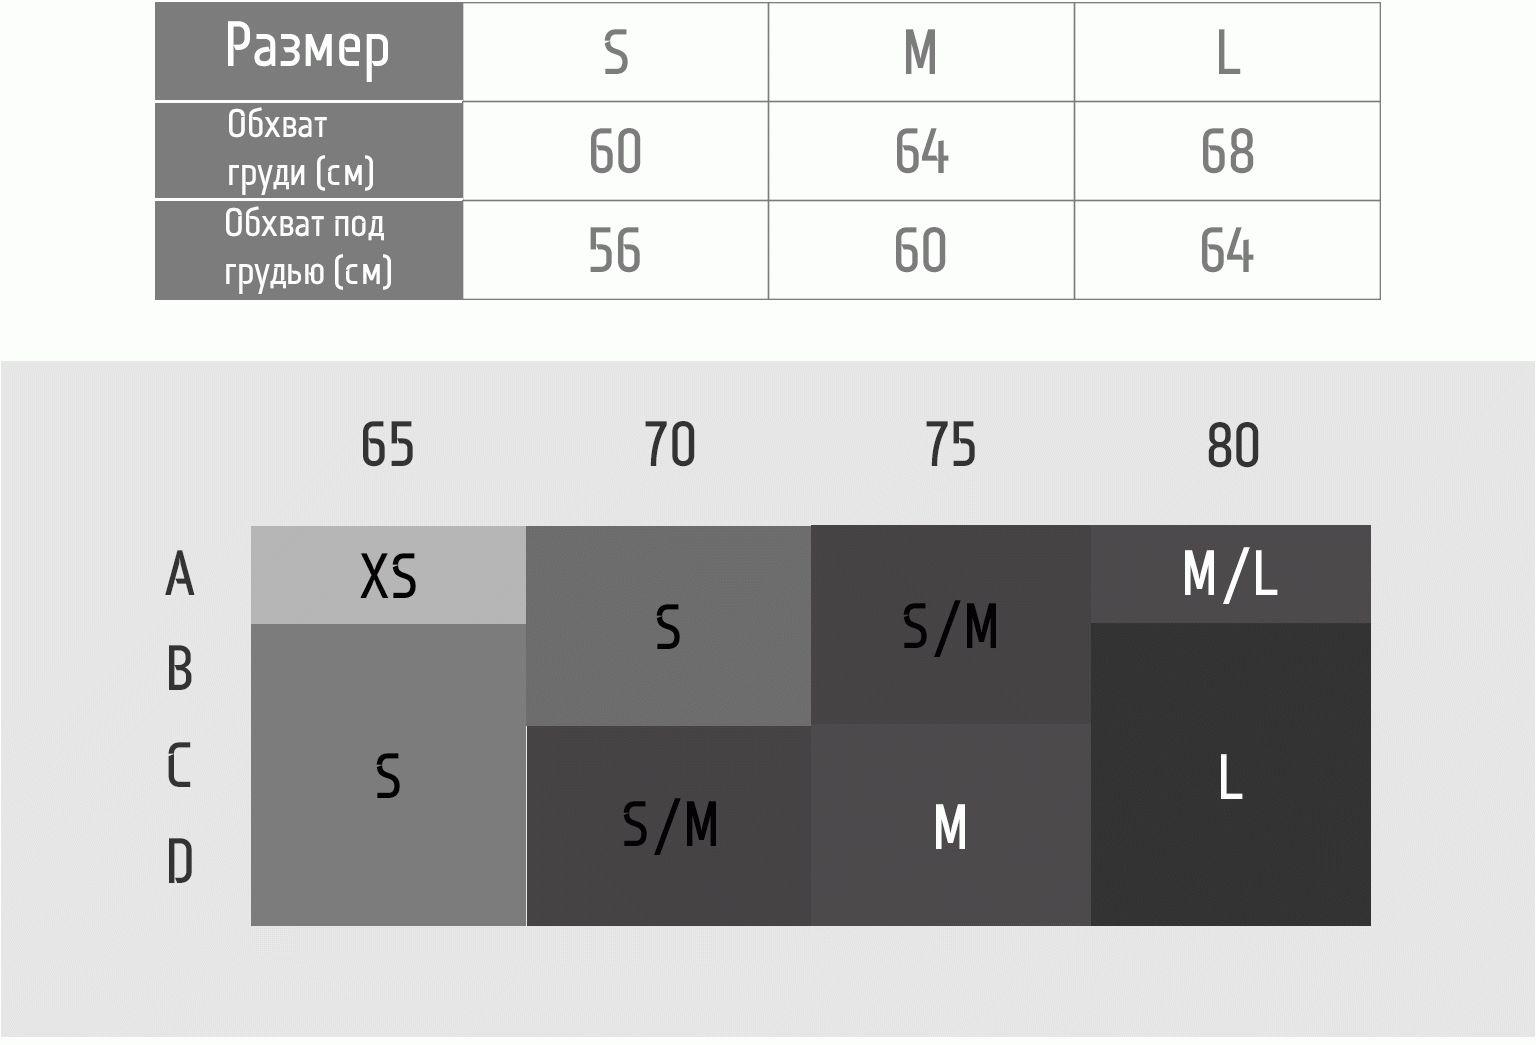 таблица топов элегант